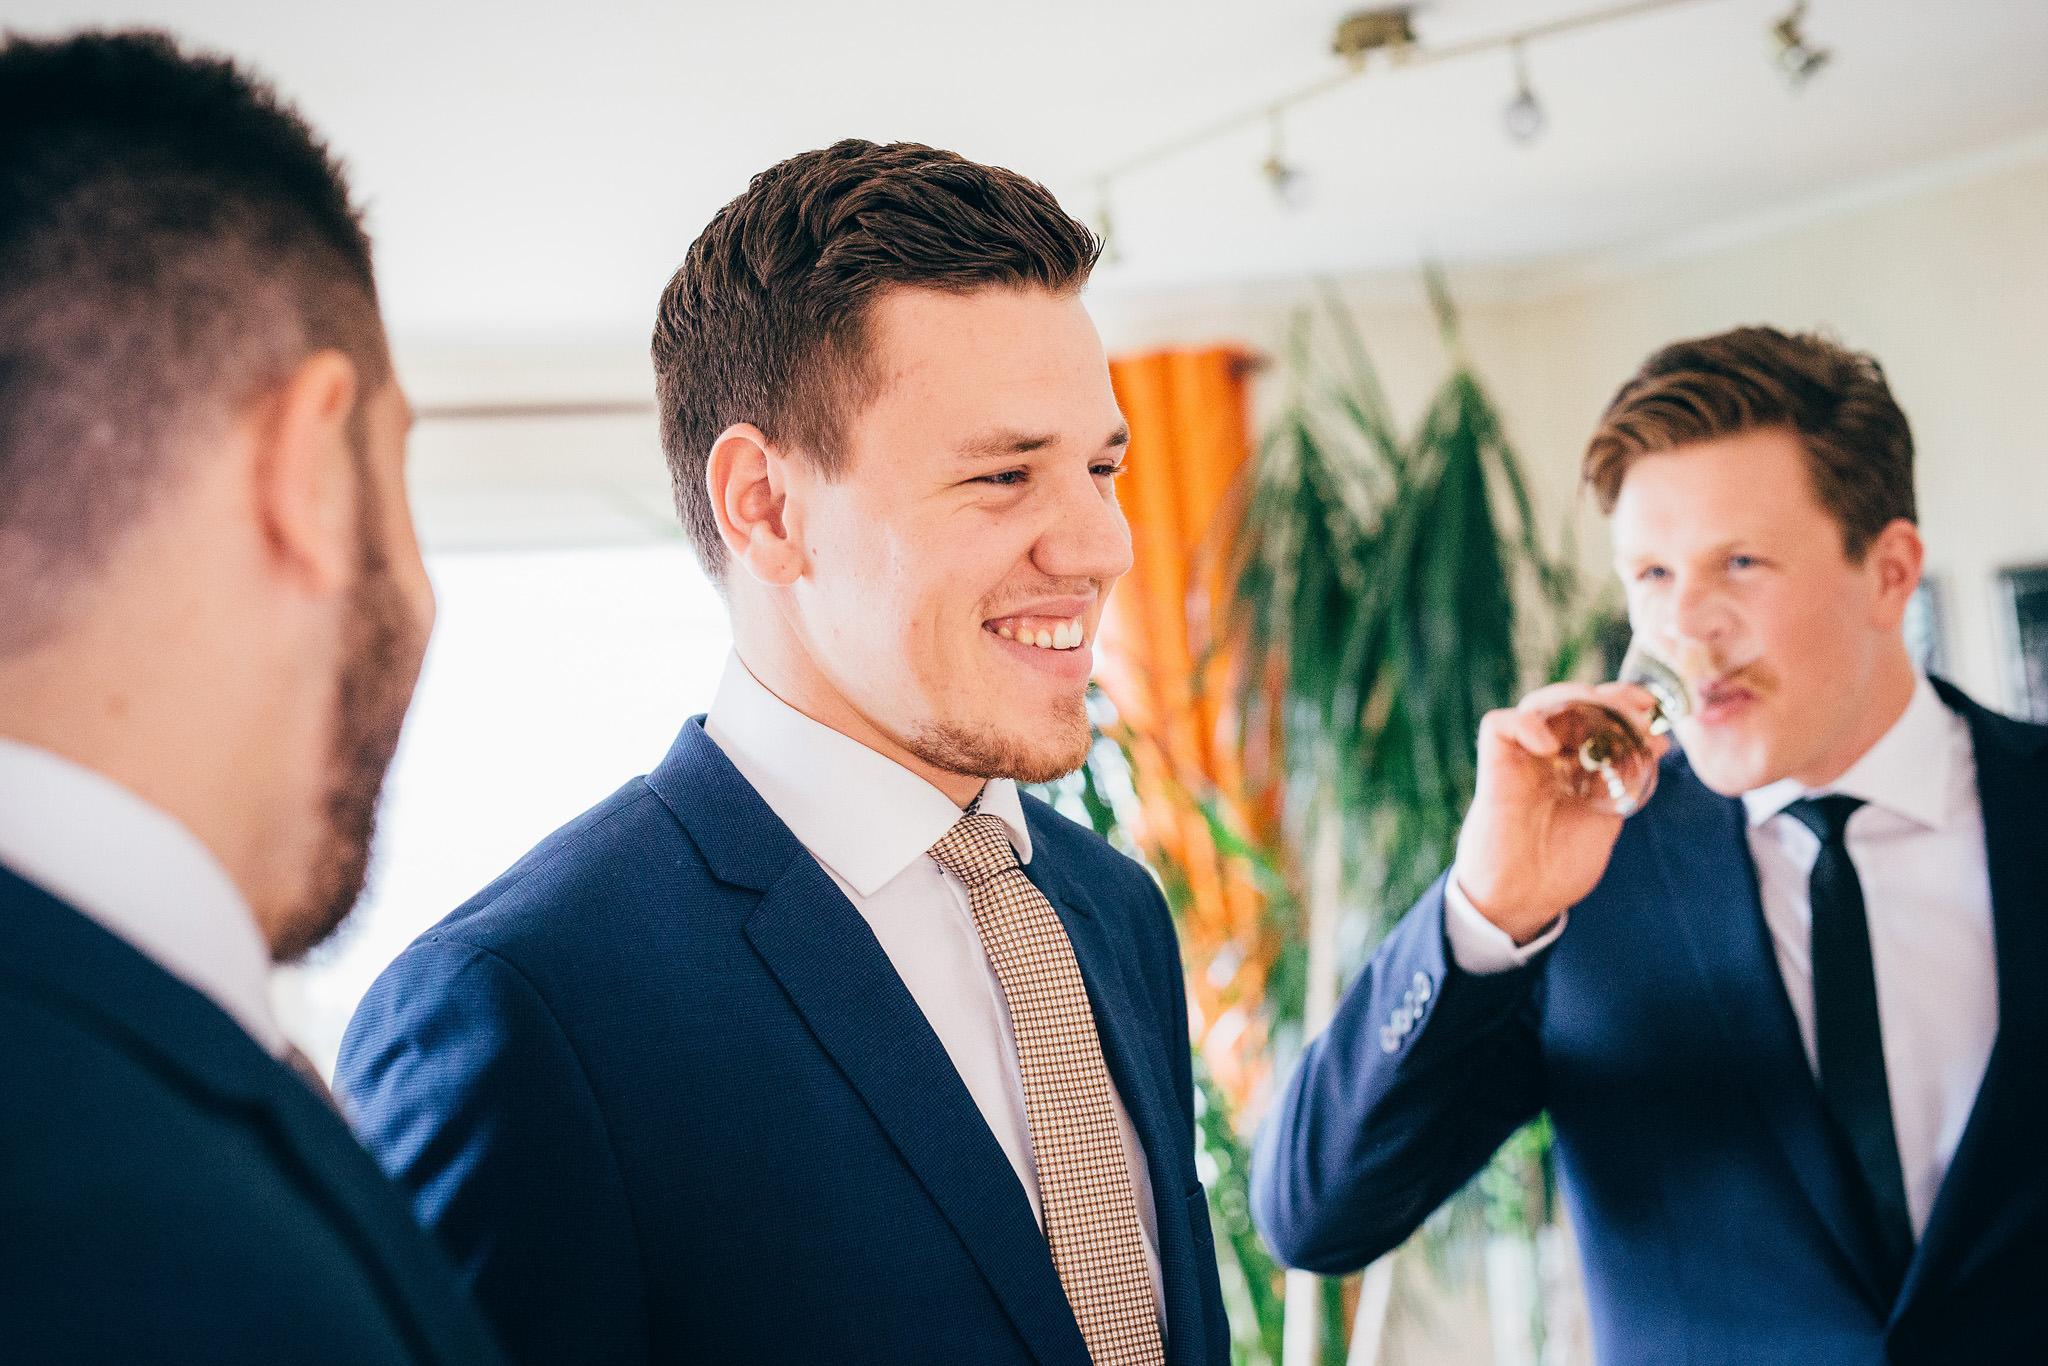 Norway+wedding+photographer+elopement+pre+wedding+Casey+Arneson-14.jpg